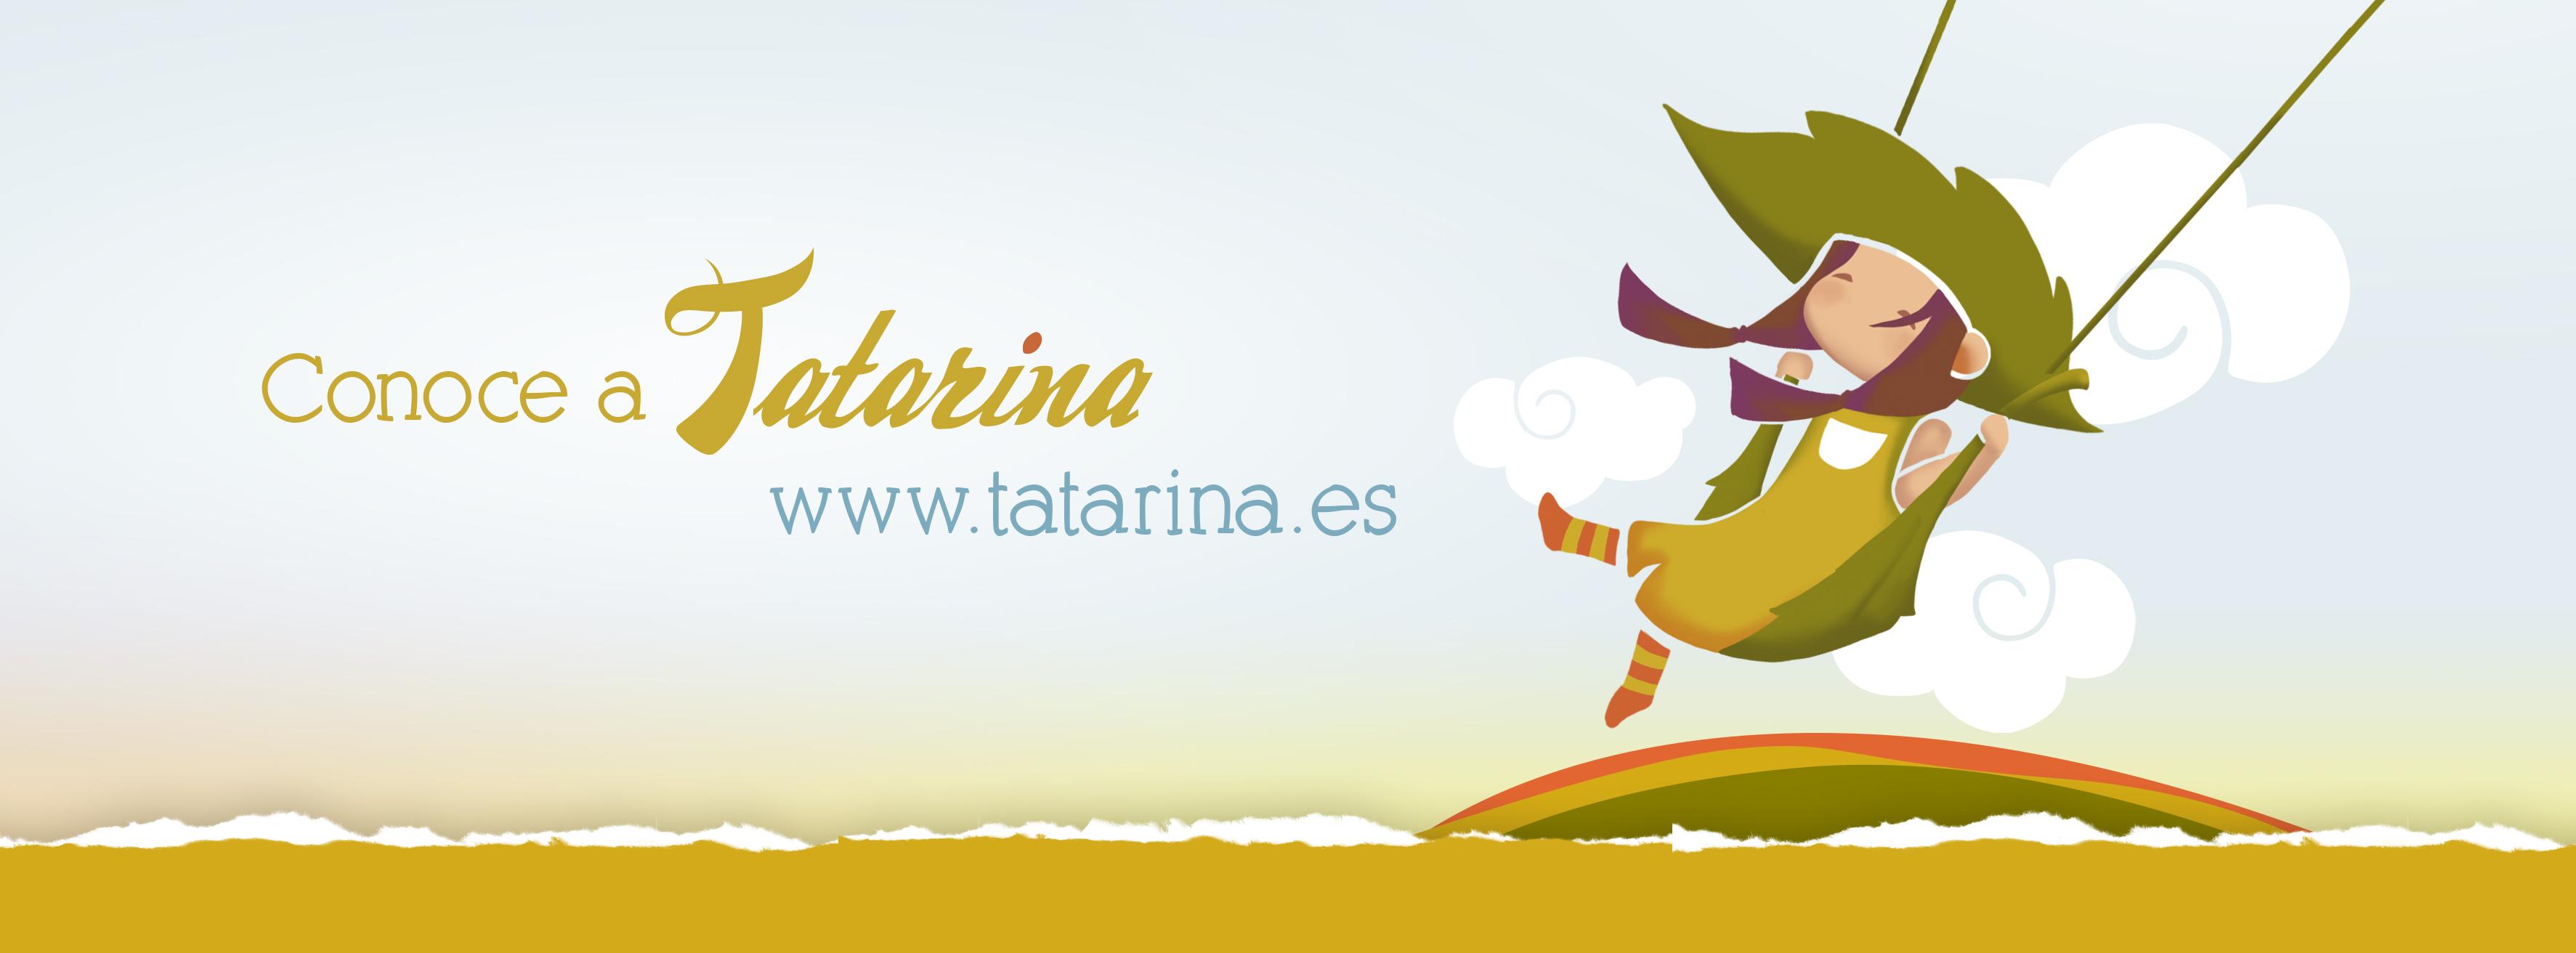 tatarina.es